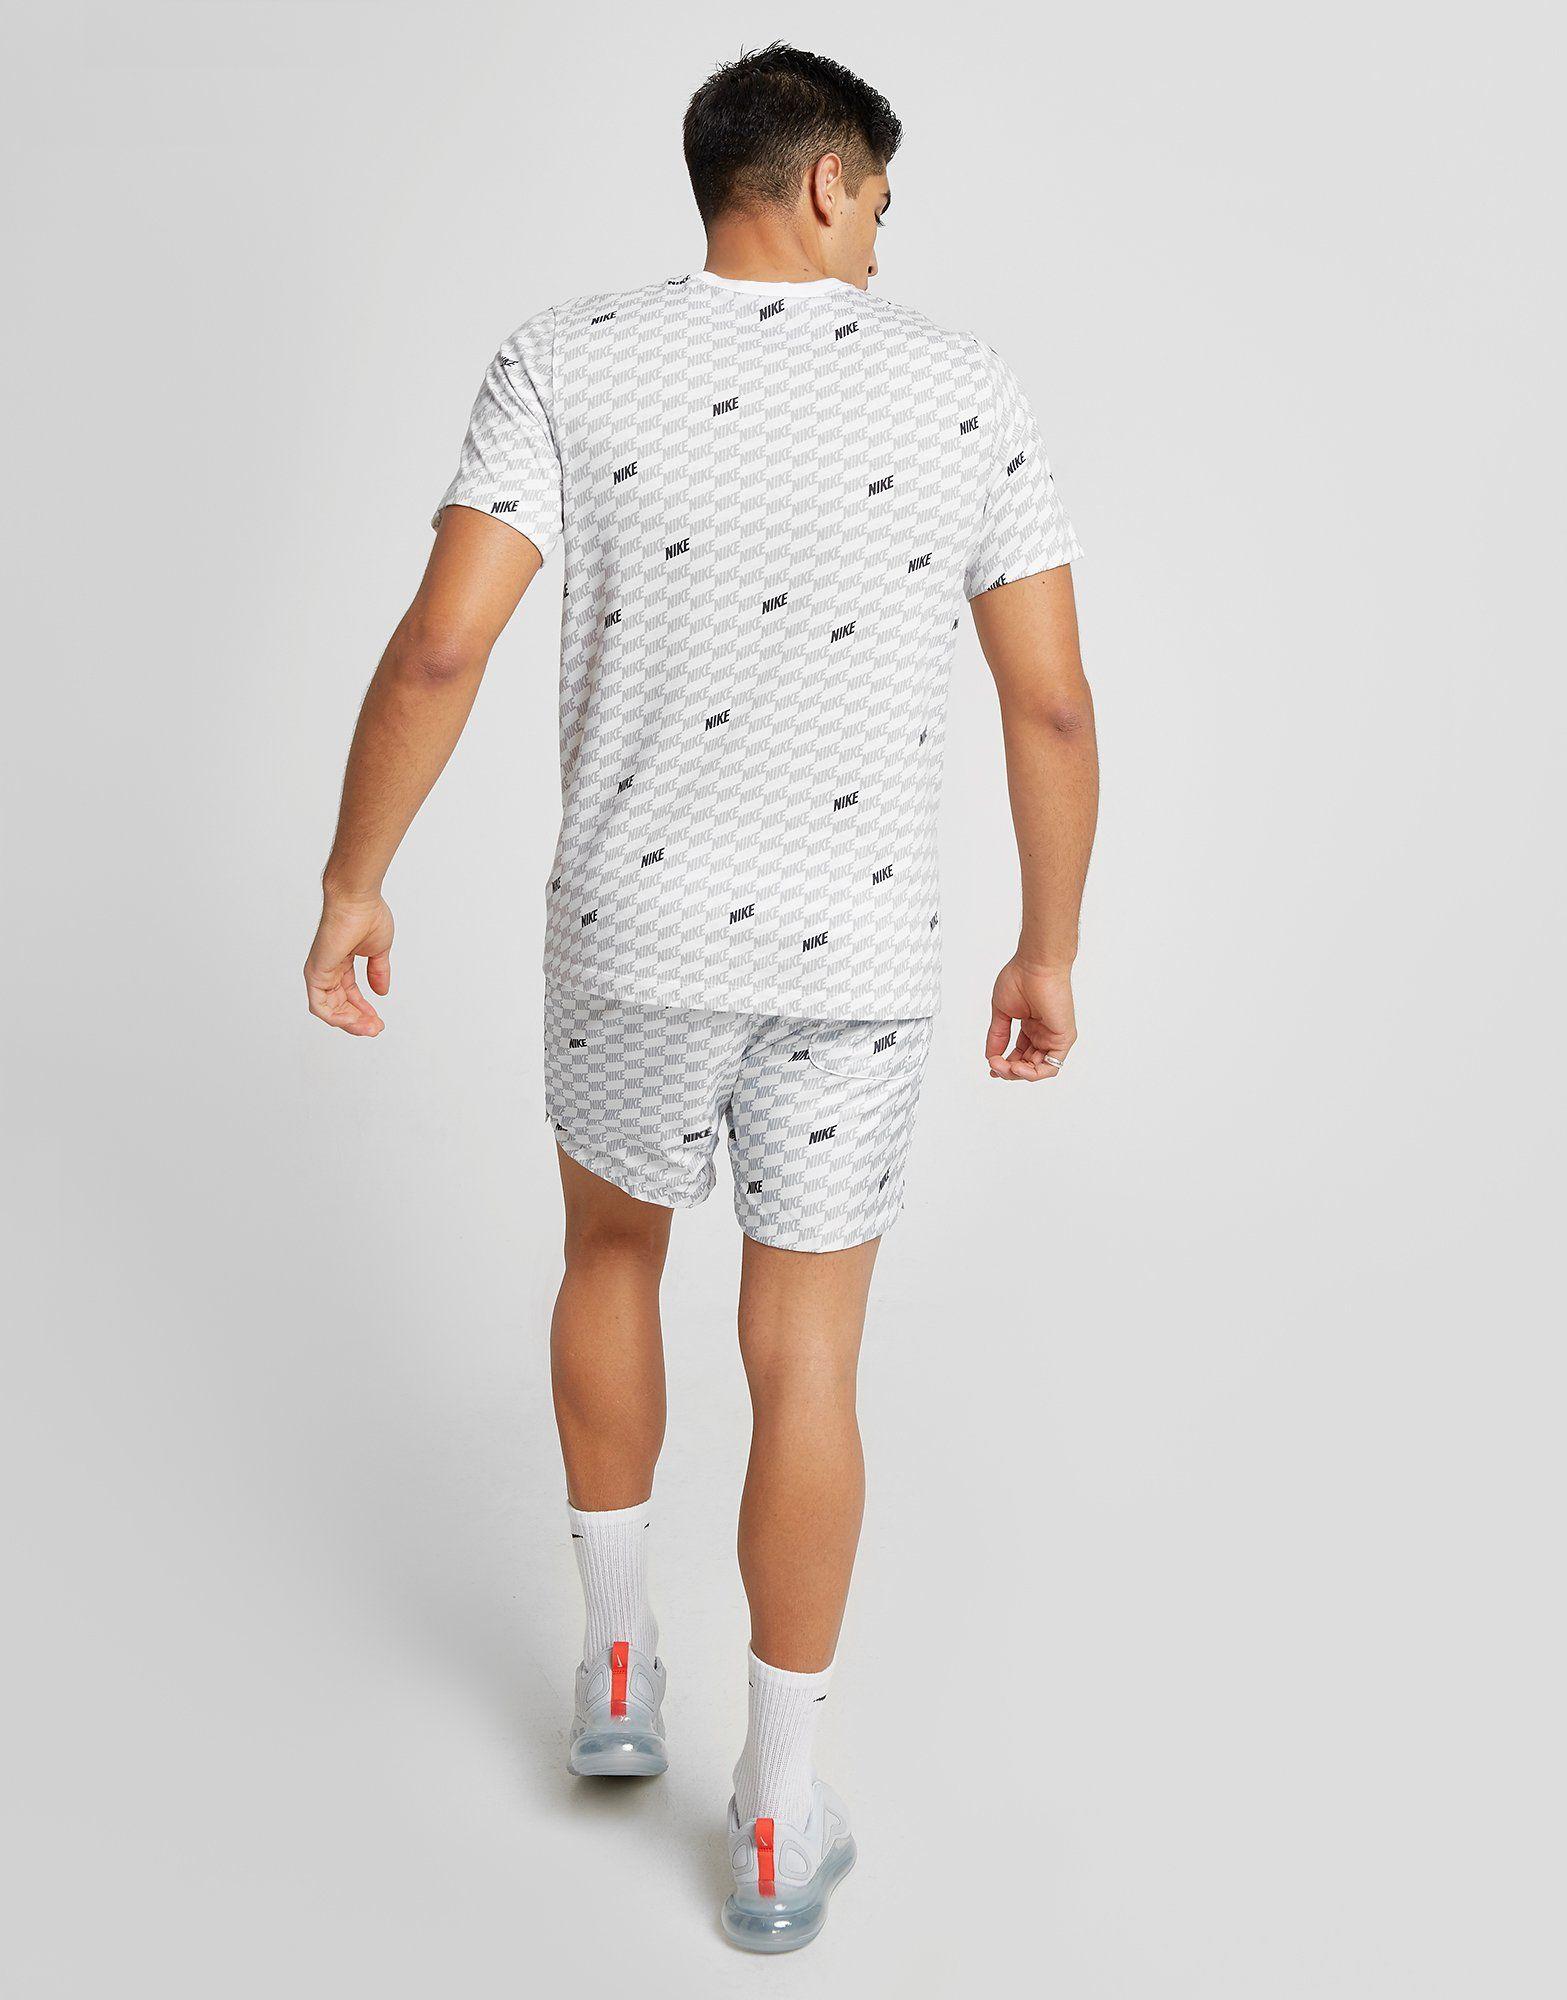 Nike Hybrid All Over Print T-Shirt